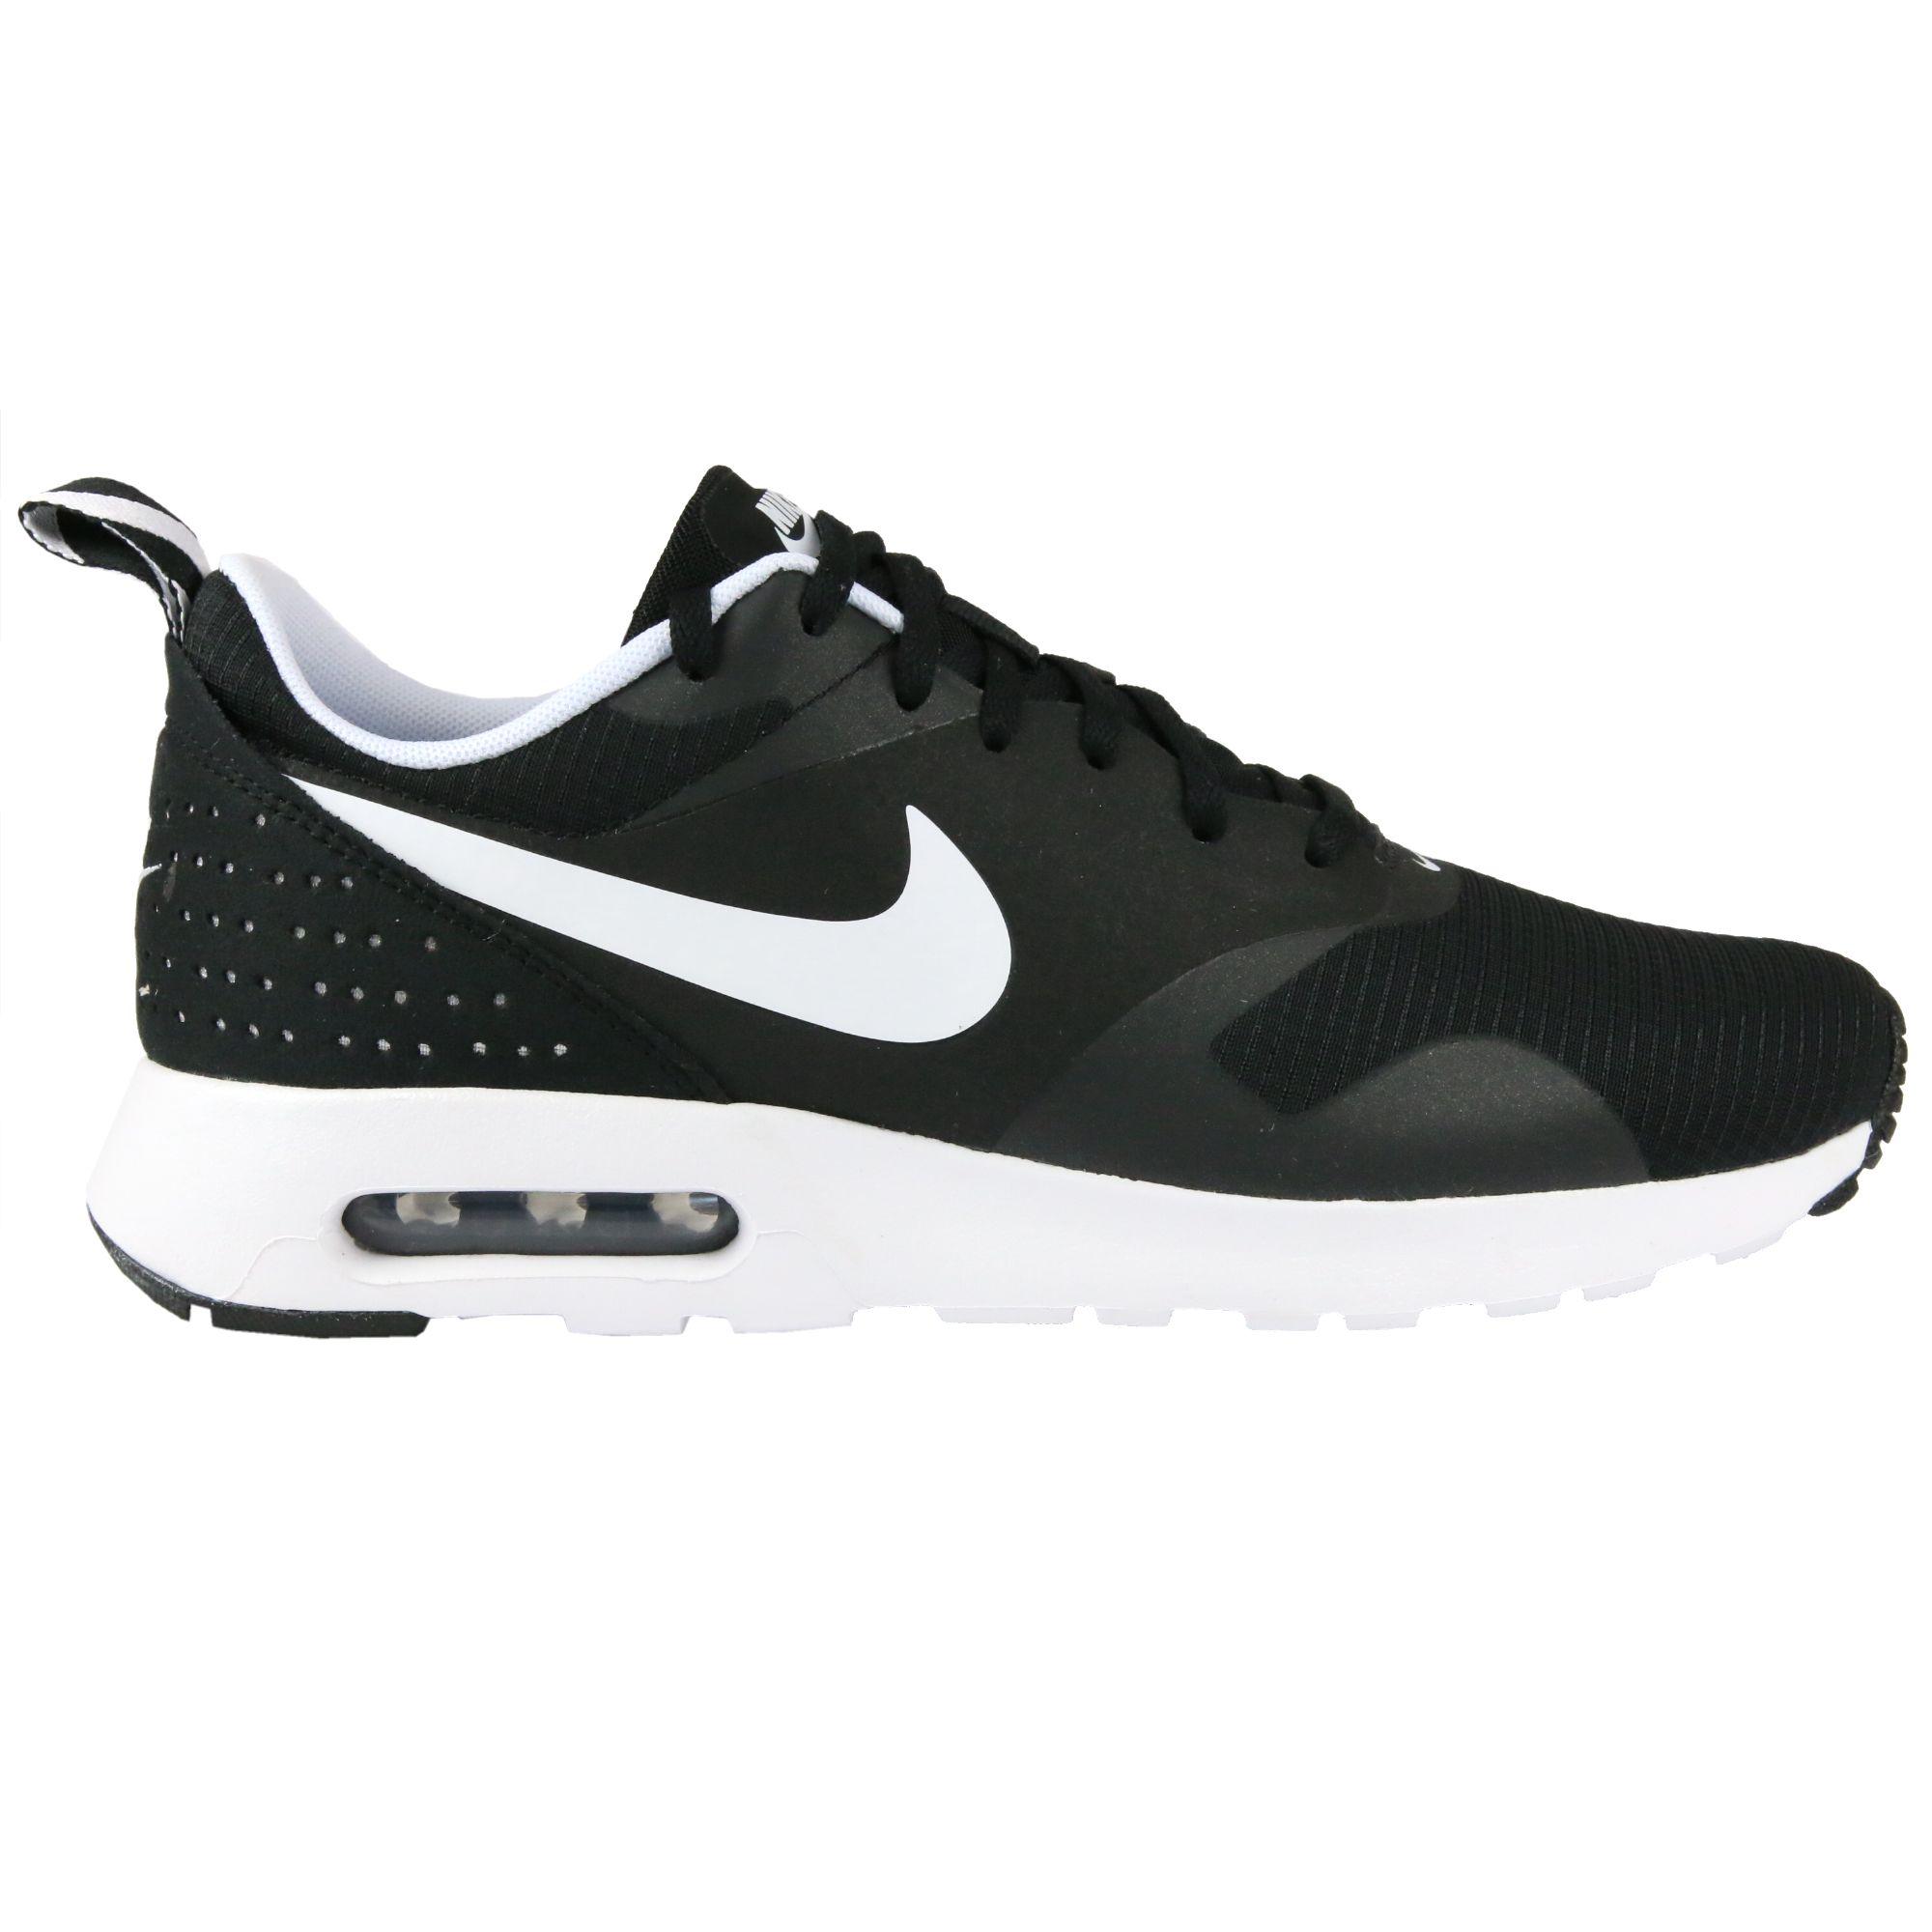 Nike Air Max Weiß Grau Herren